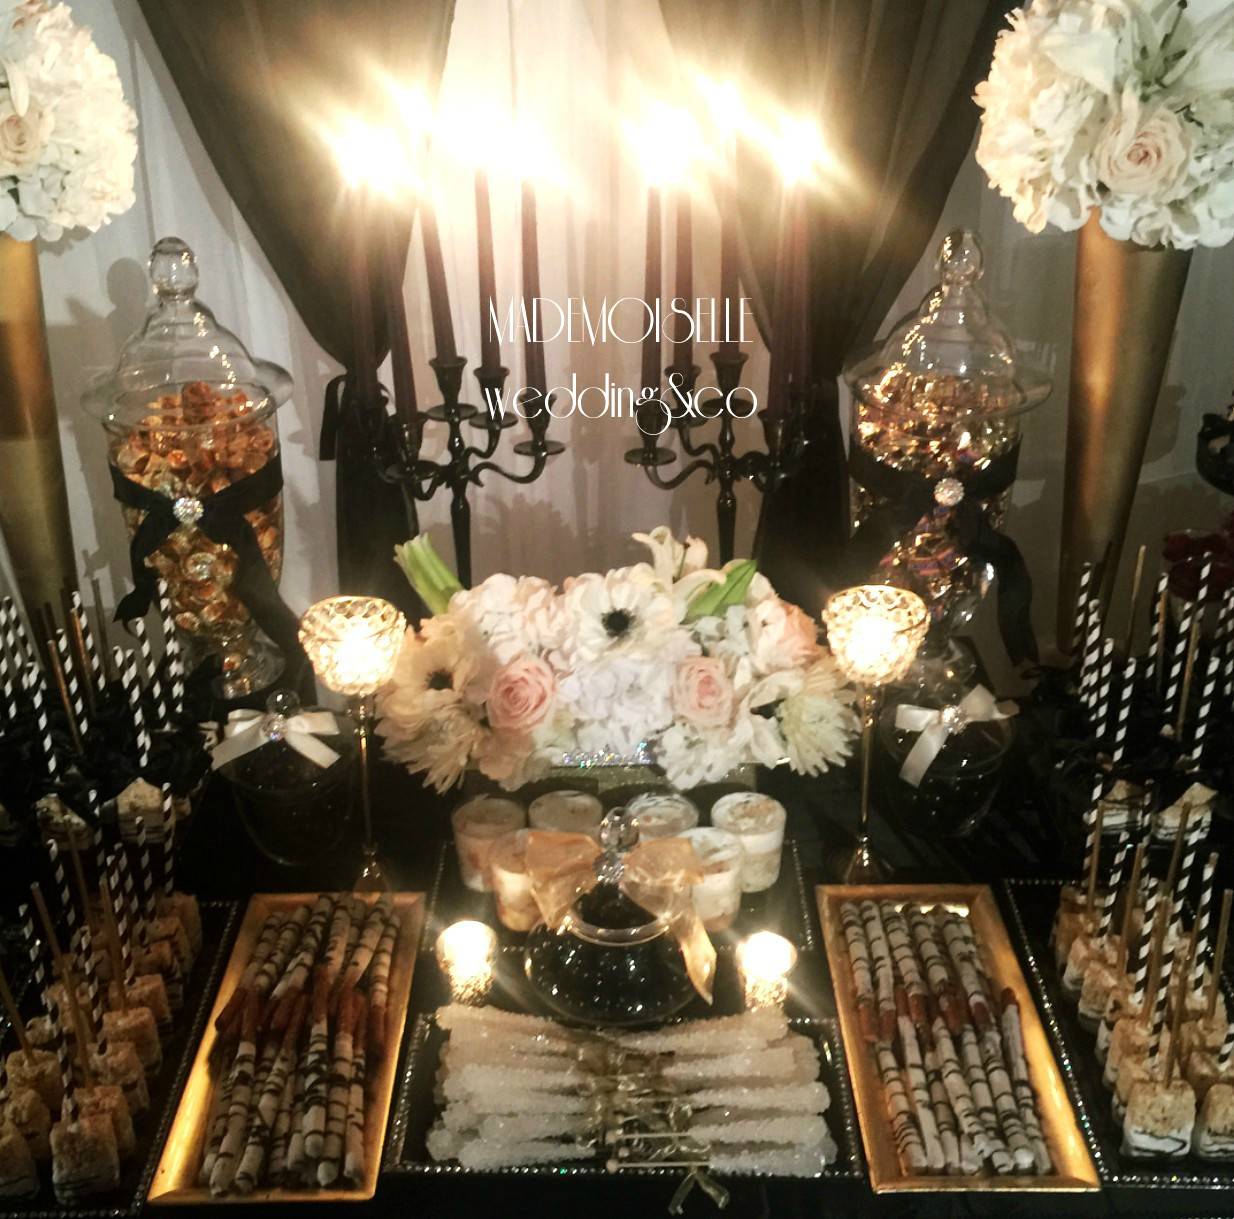 Slatki sto-dekoracija za slatki sto-dekoracija slatkog stola-kolaci-cupecakes-crno zlatna dekoracija slatkog stola-muffins-cakepops-dekoracija krstenja-beograd